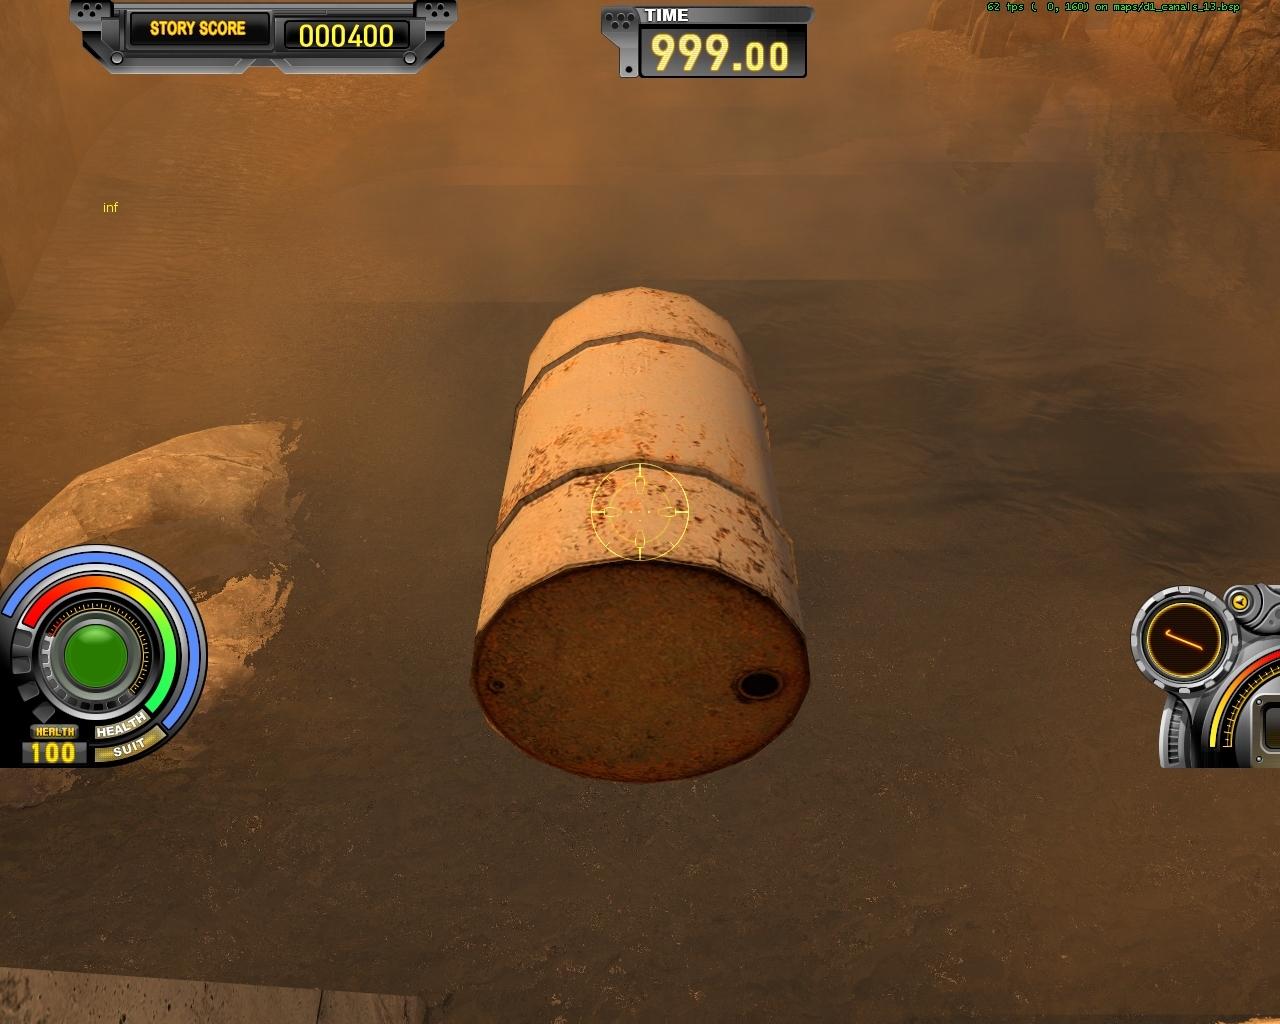 d1_canals_130026.jpg - Half-Life 2 Half-Life 2 Survivor, HL2Survivor